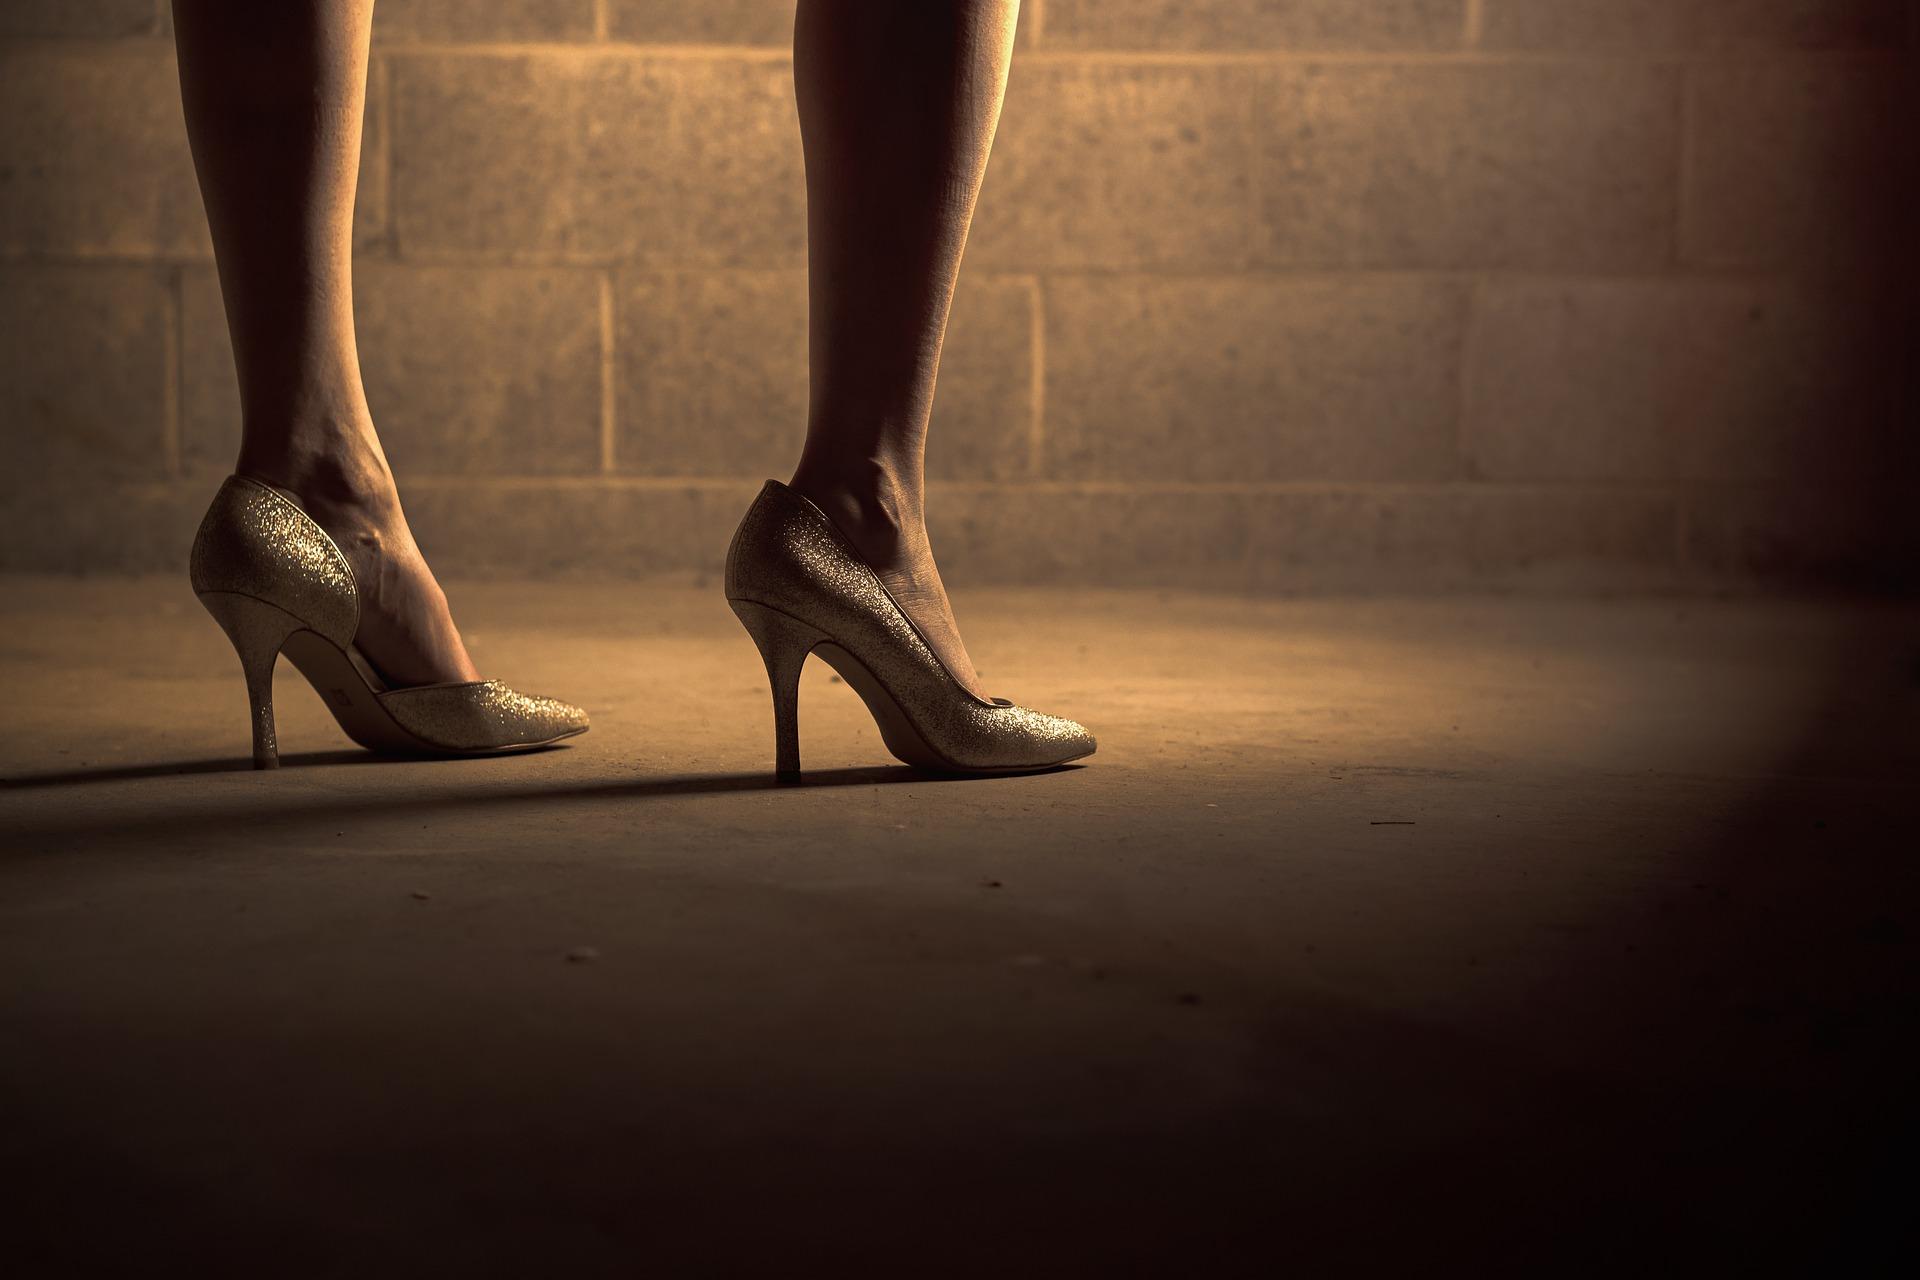 mujere protituta prostitutas en youtube